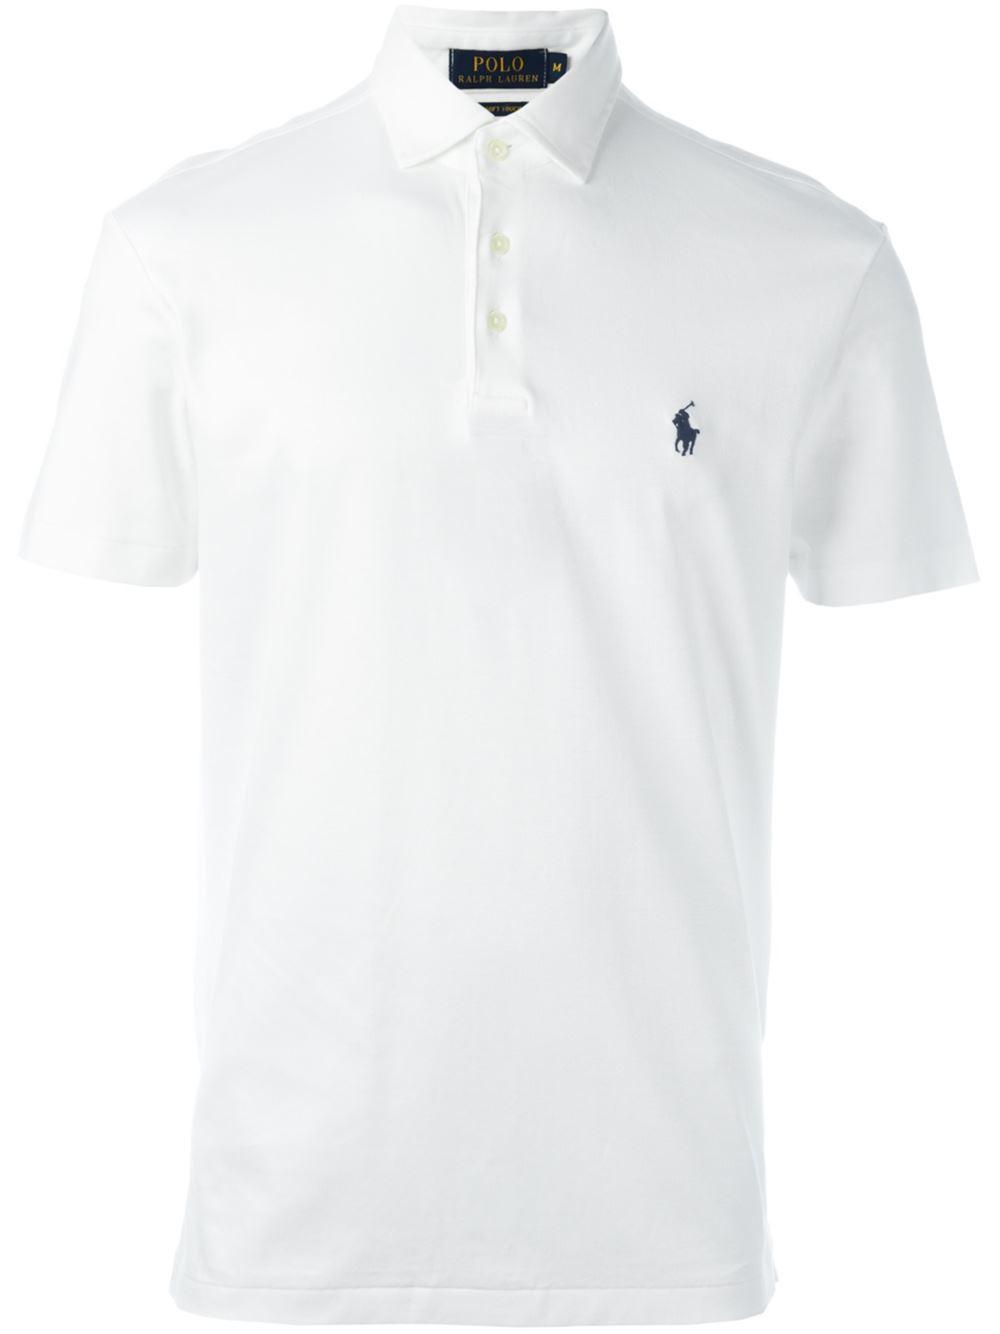 Polo ralph lauren embroidered logo polo shirt in white for for Ralph lauren logo shirt